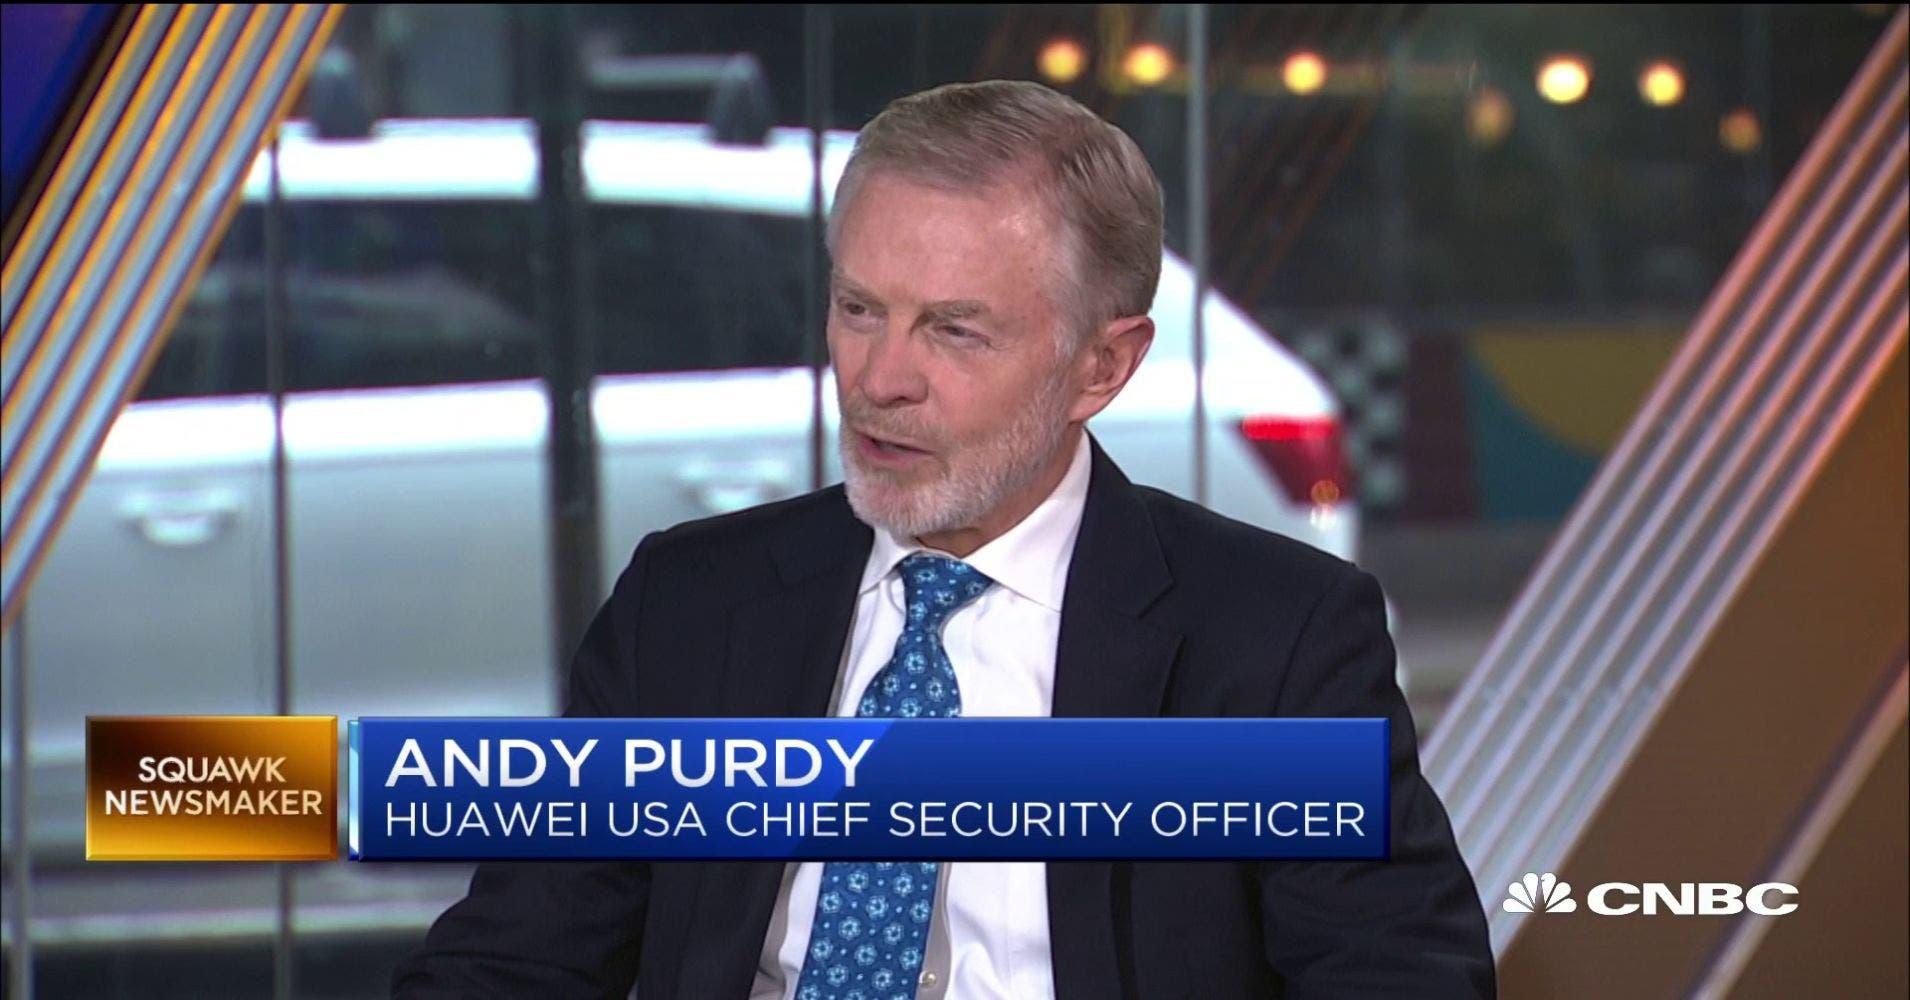 Huawei Andy Purdy